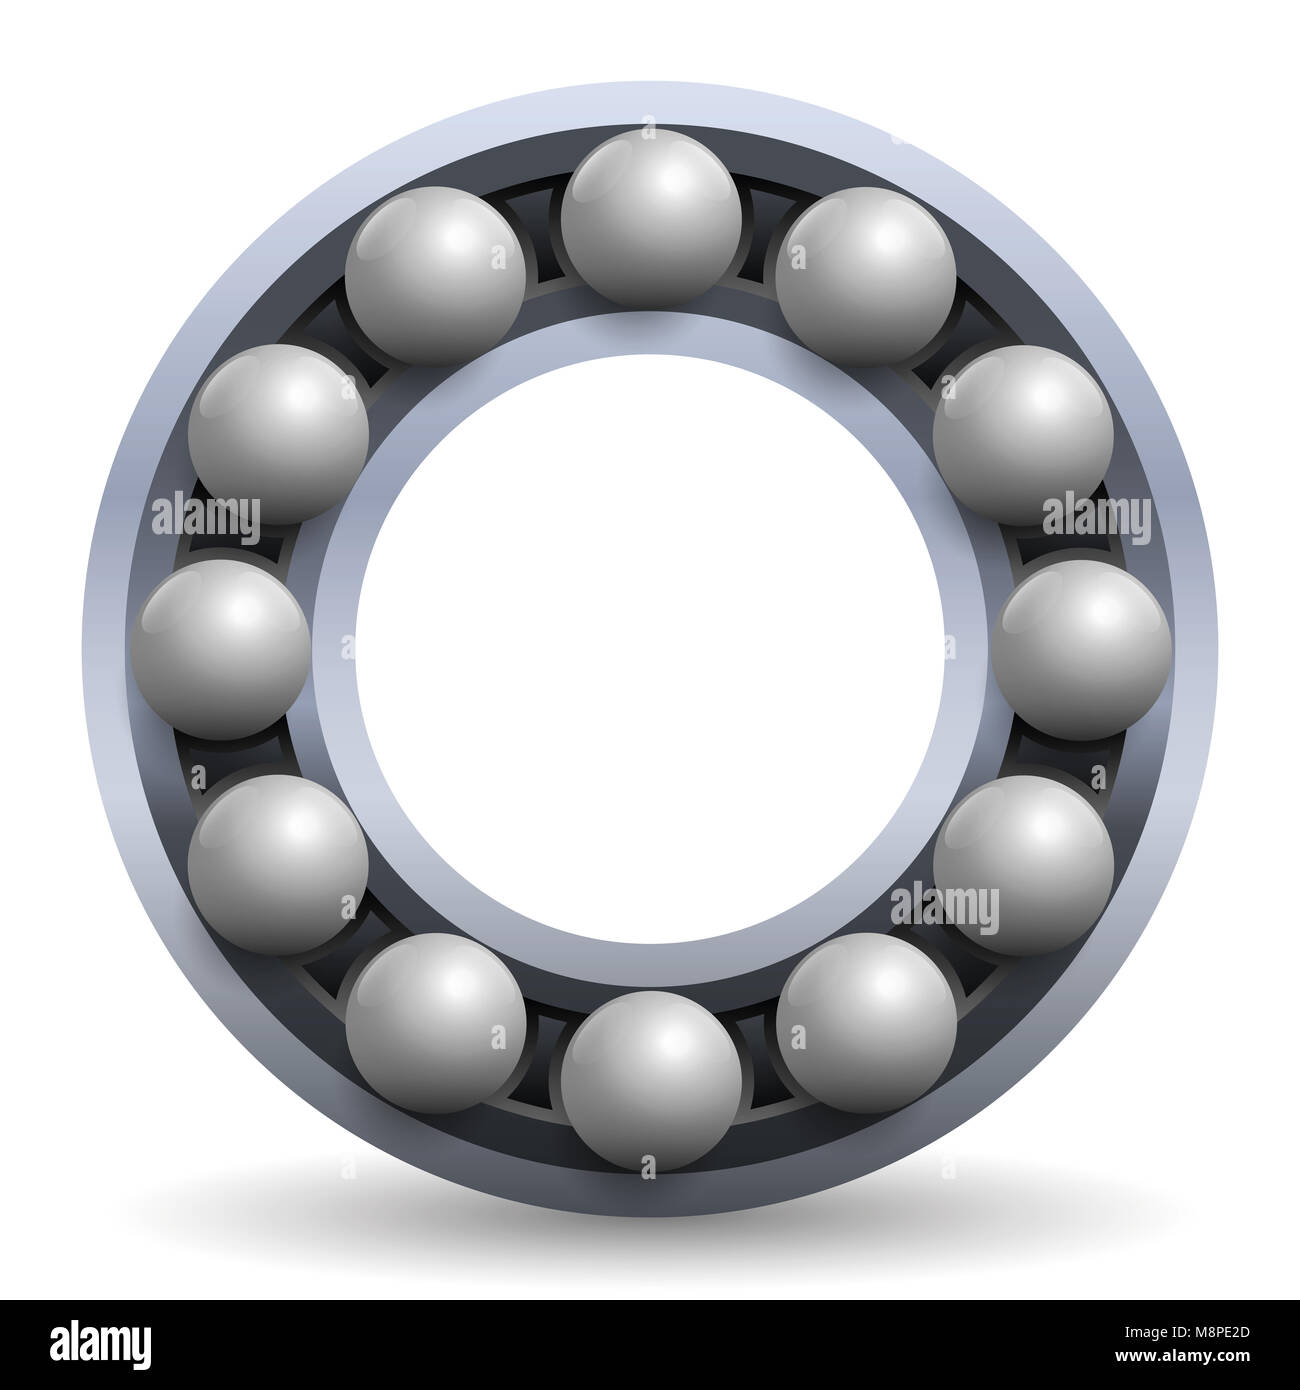 rolling bearing iron balls in a metal wheel schematic model stock  rolling bearing iron balls in a metal wheel schematic model illustration of a mechanical, technical engineering item